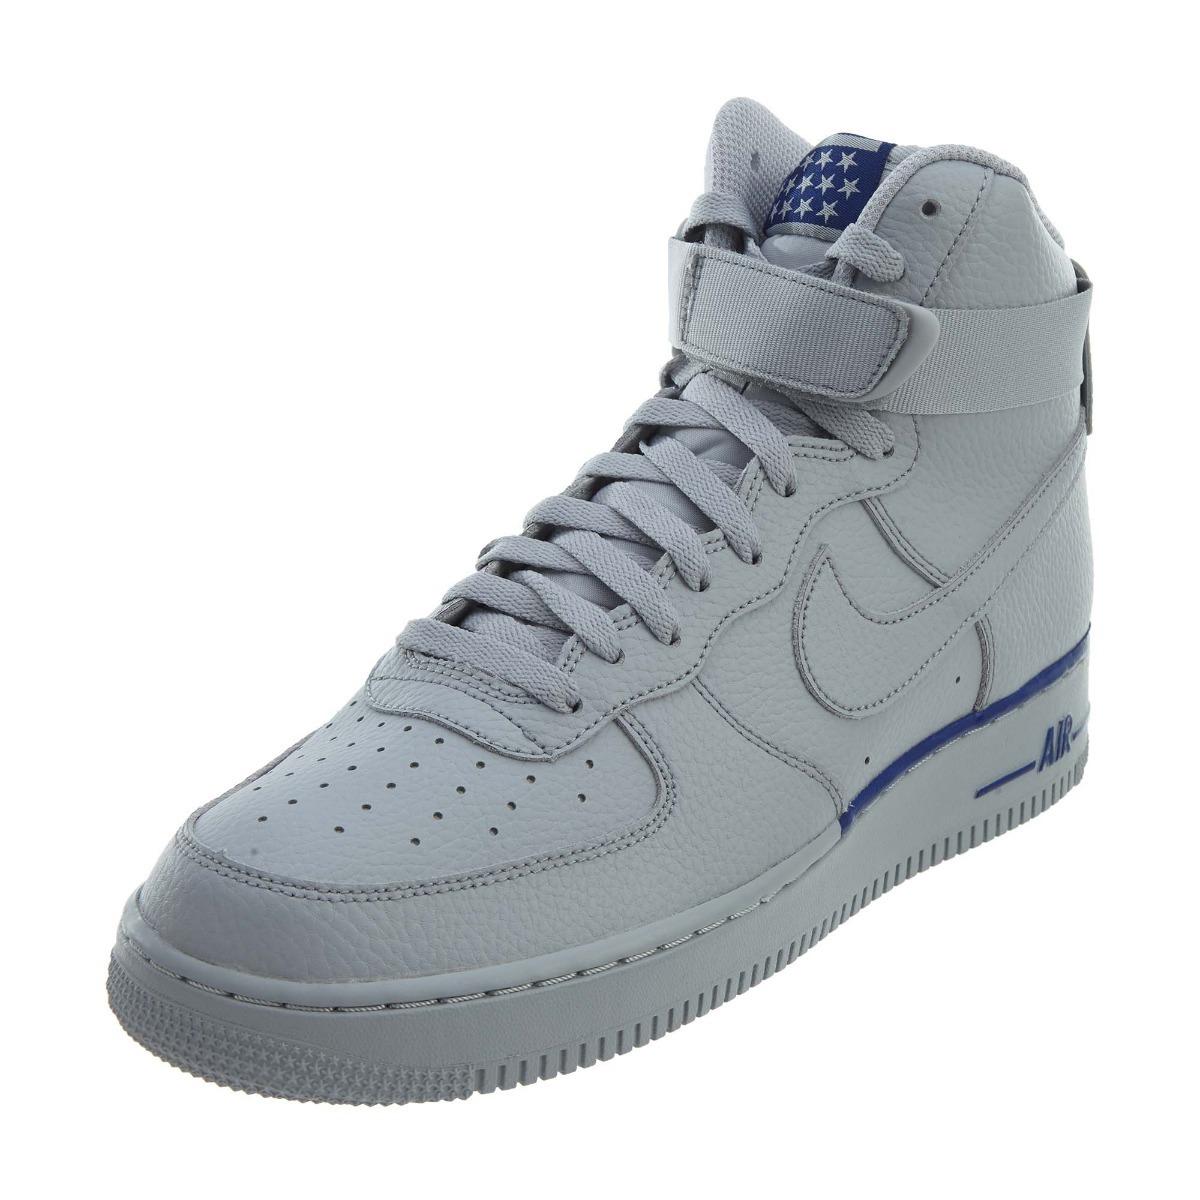 Zapatillas Nike Air Force 1 High 07 Hombre Urbanas C Envio